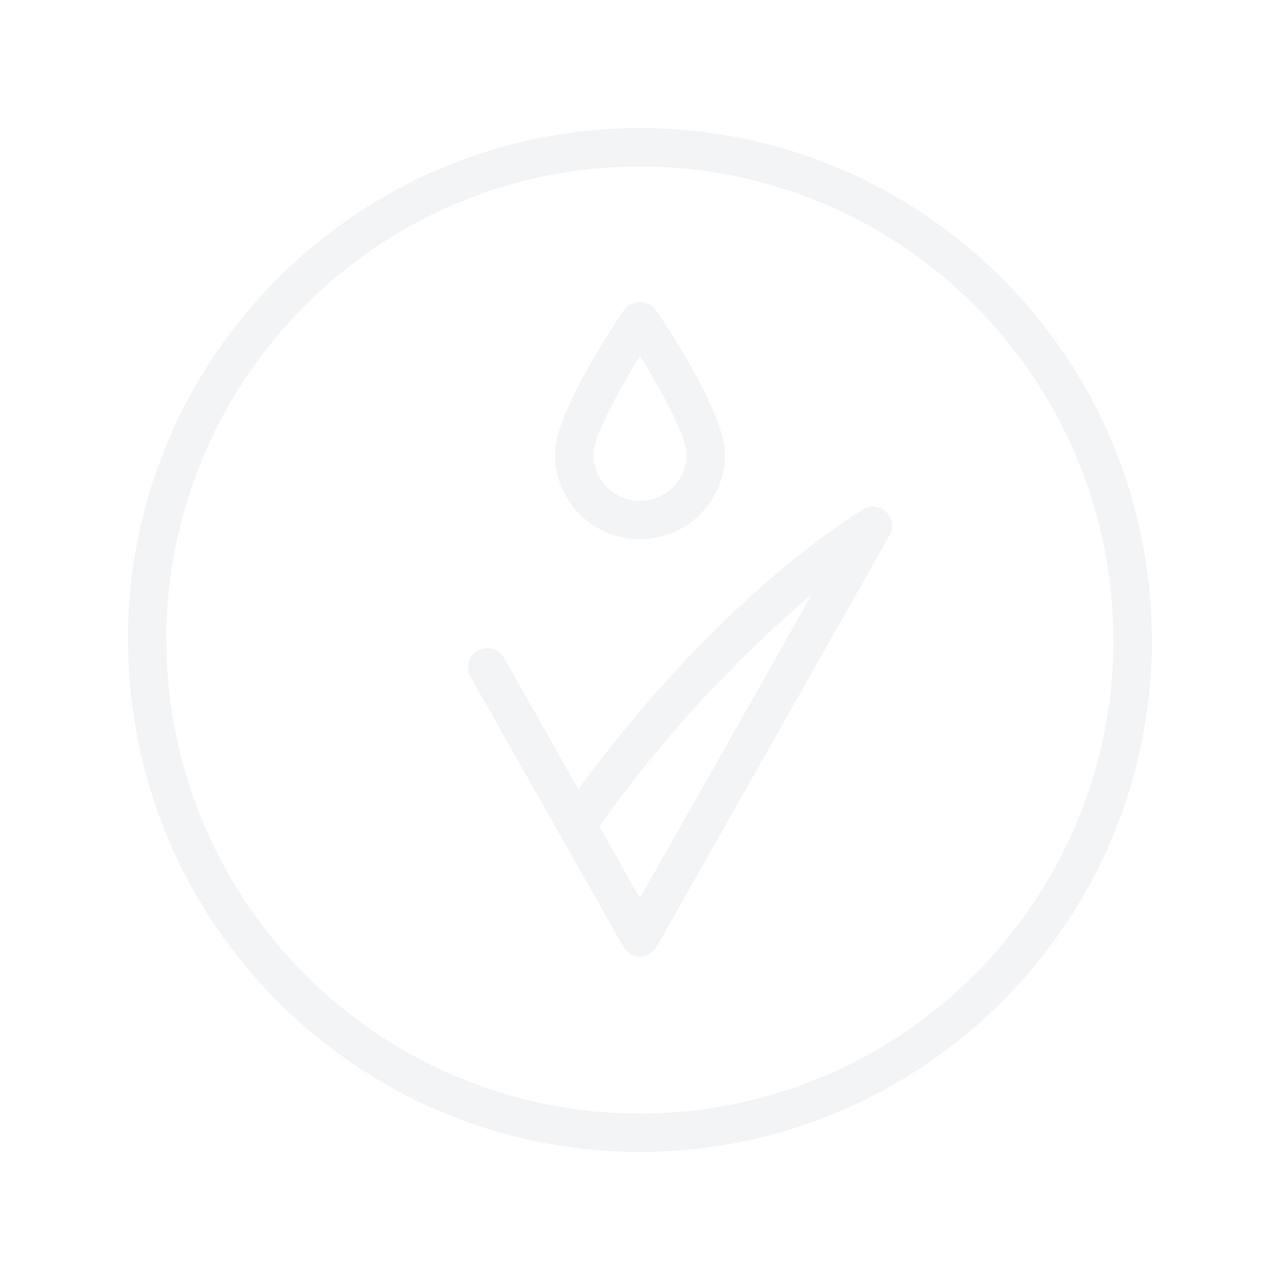 E.L.F. Flawless Eyeshadow Palette 4g